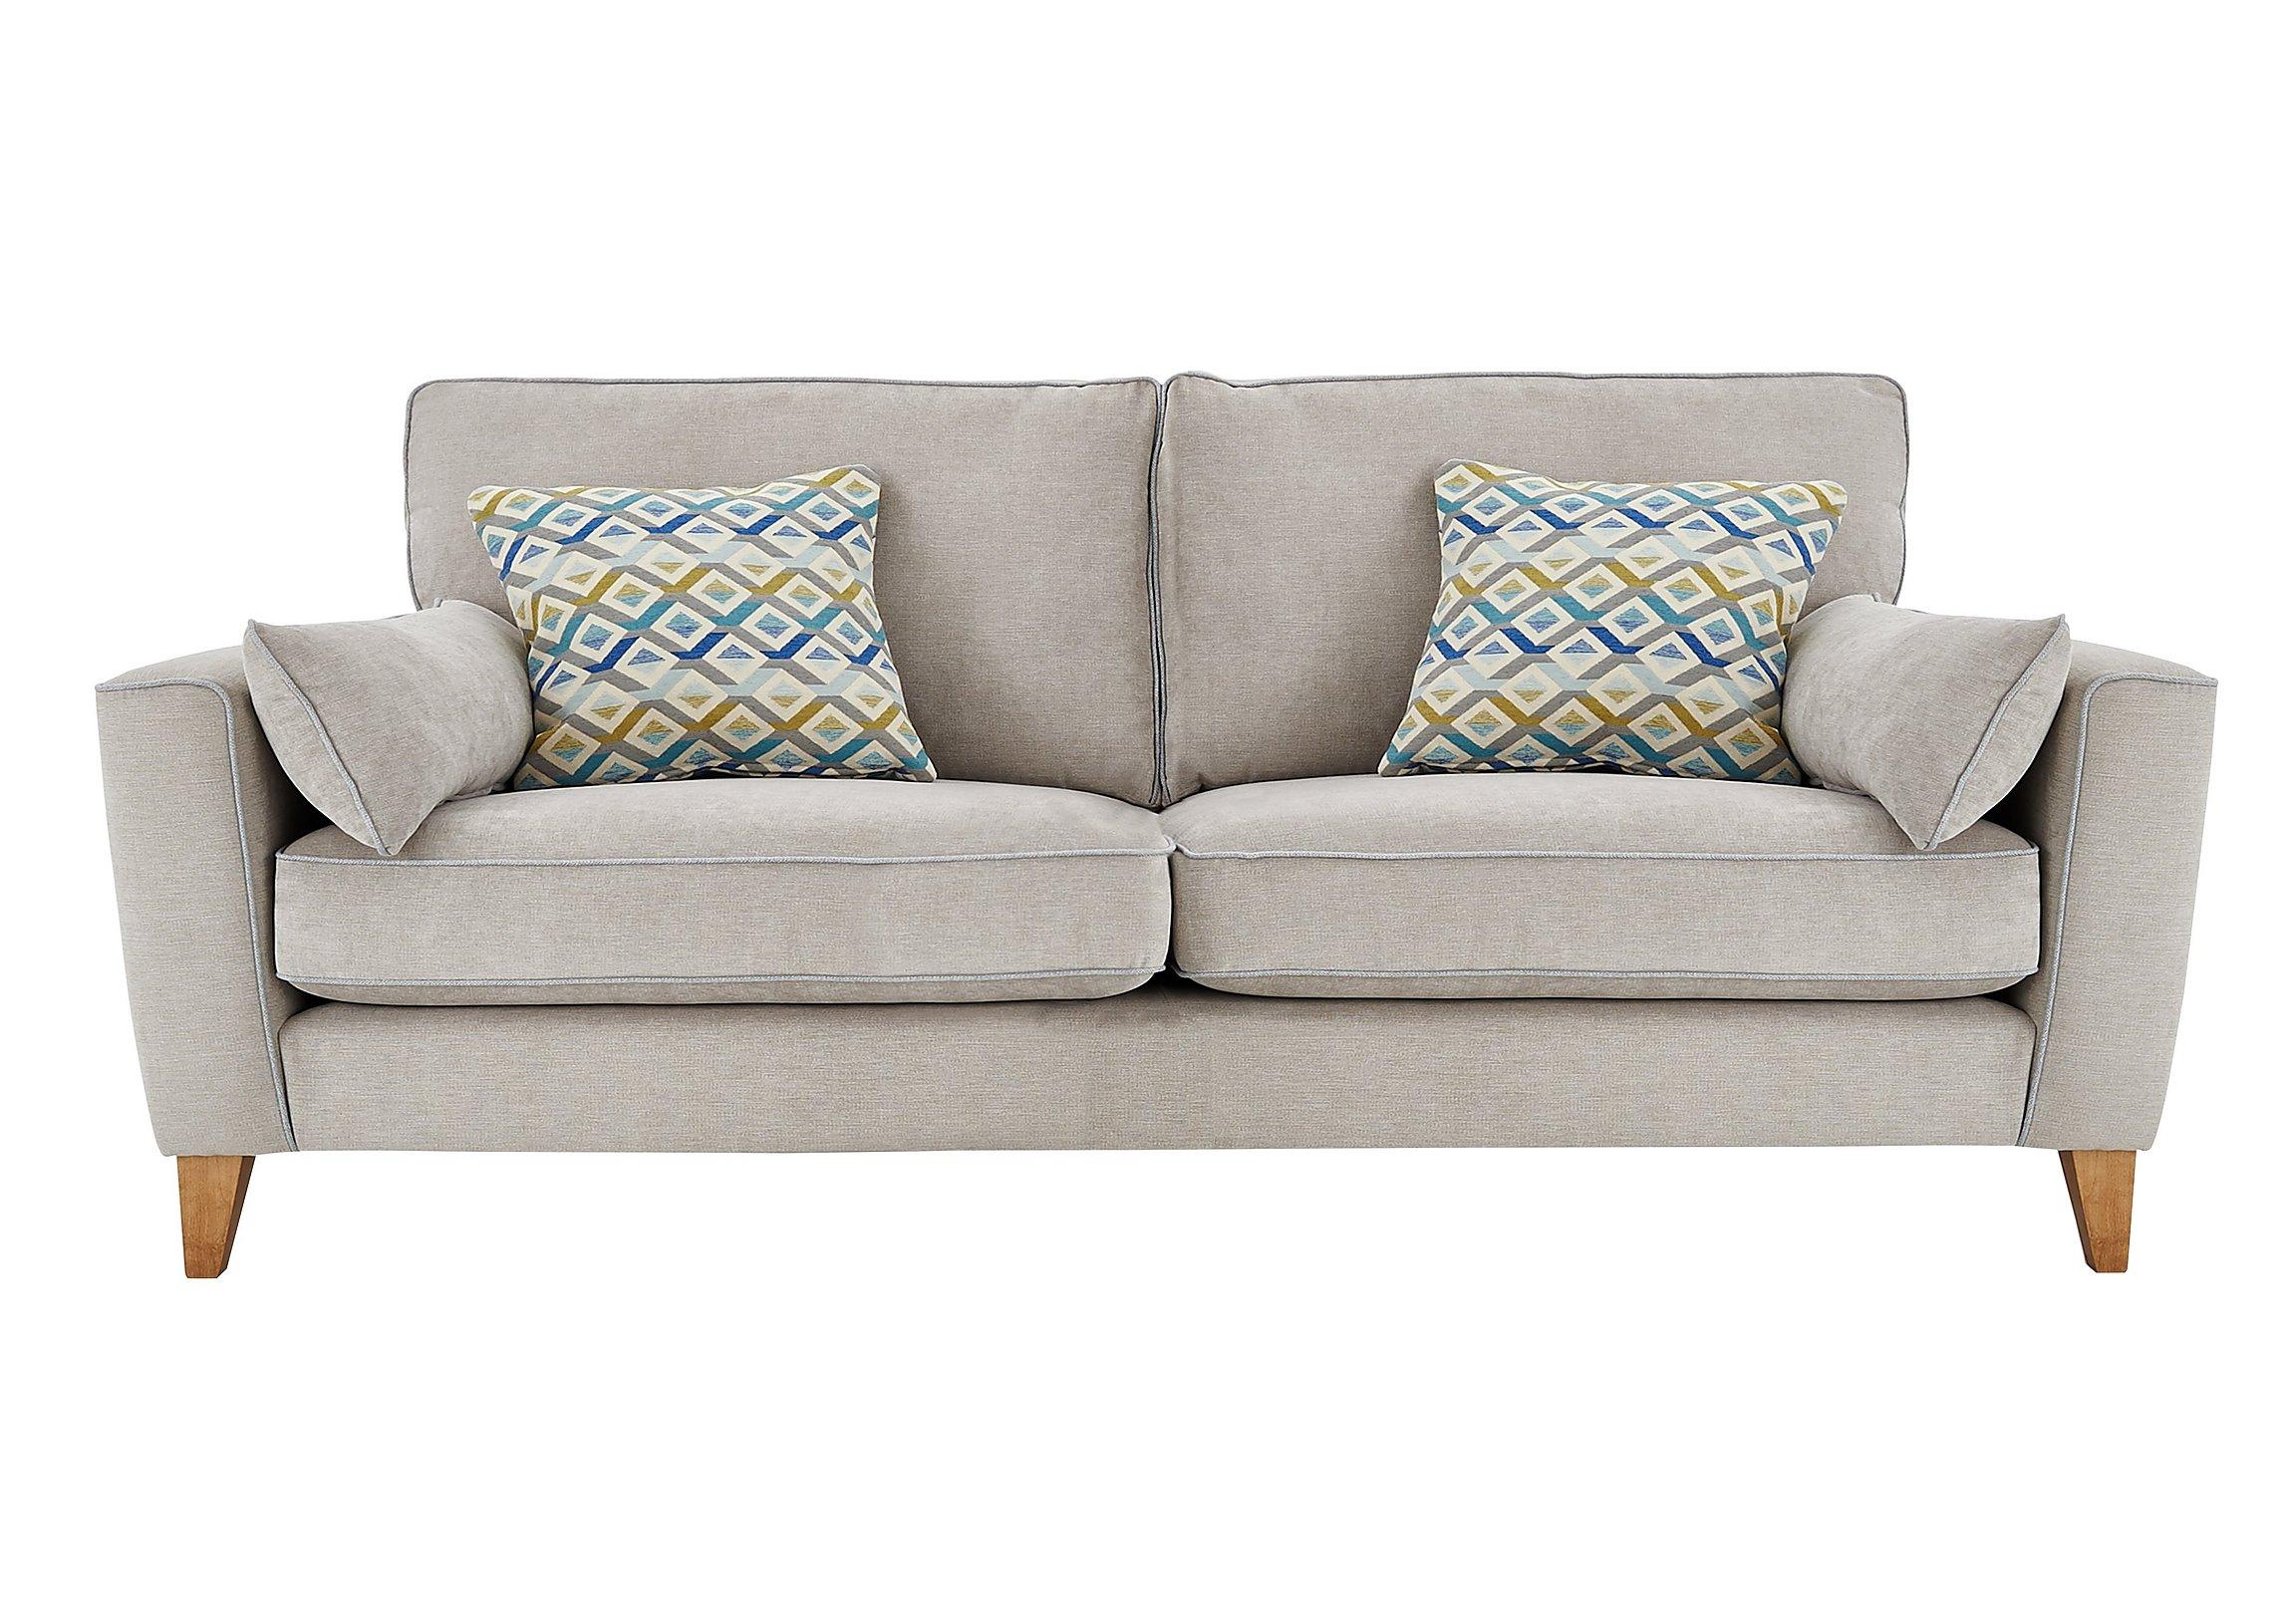 Grey fabric sofa furniture village wiado sofa for Furniture village